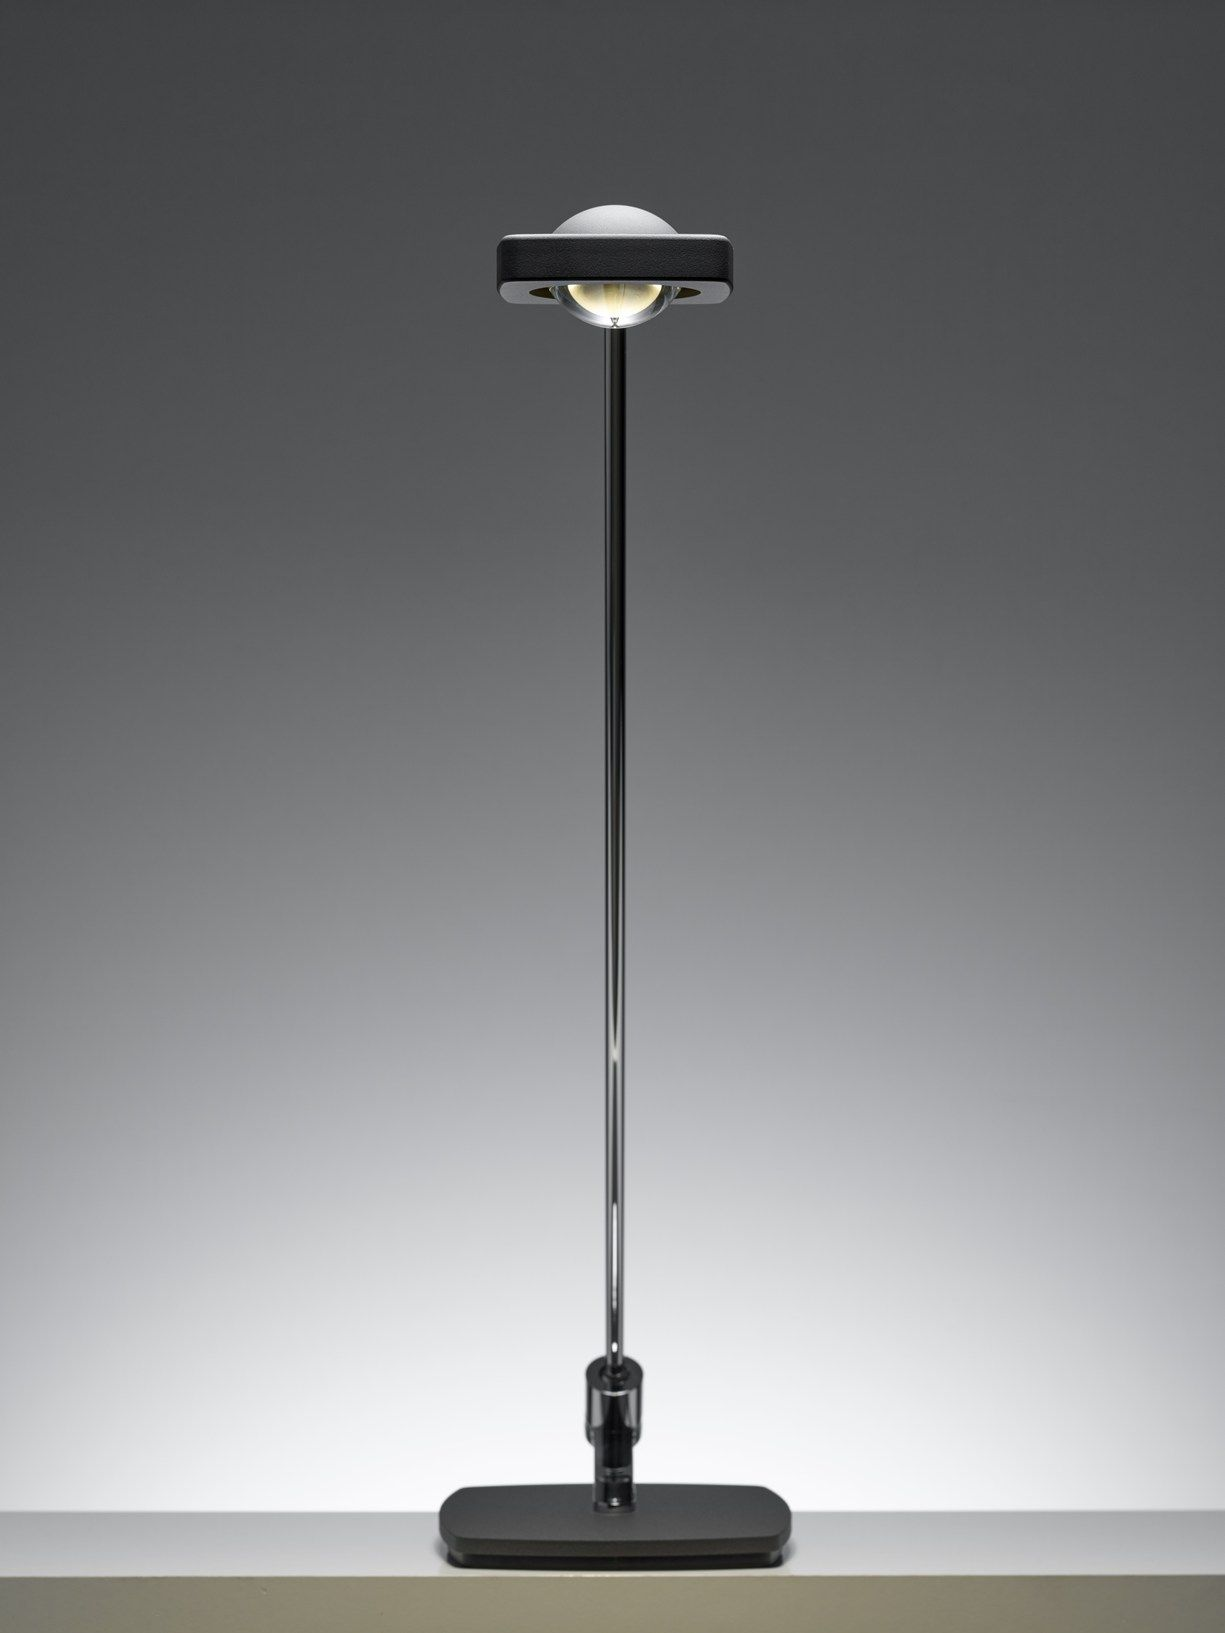 Kelveen Lamp by Oligo   Modern interiors, Interiors and Lights